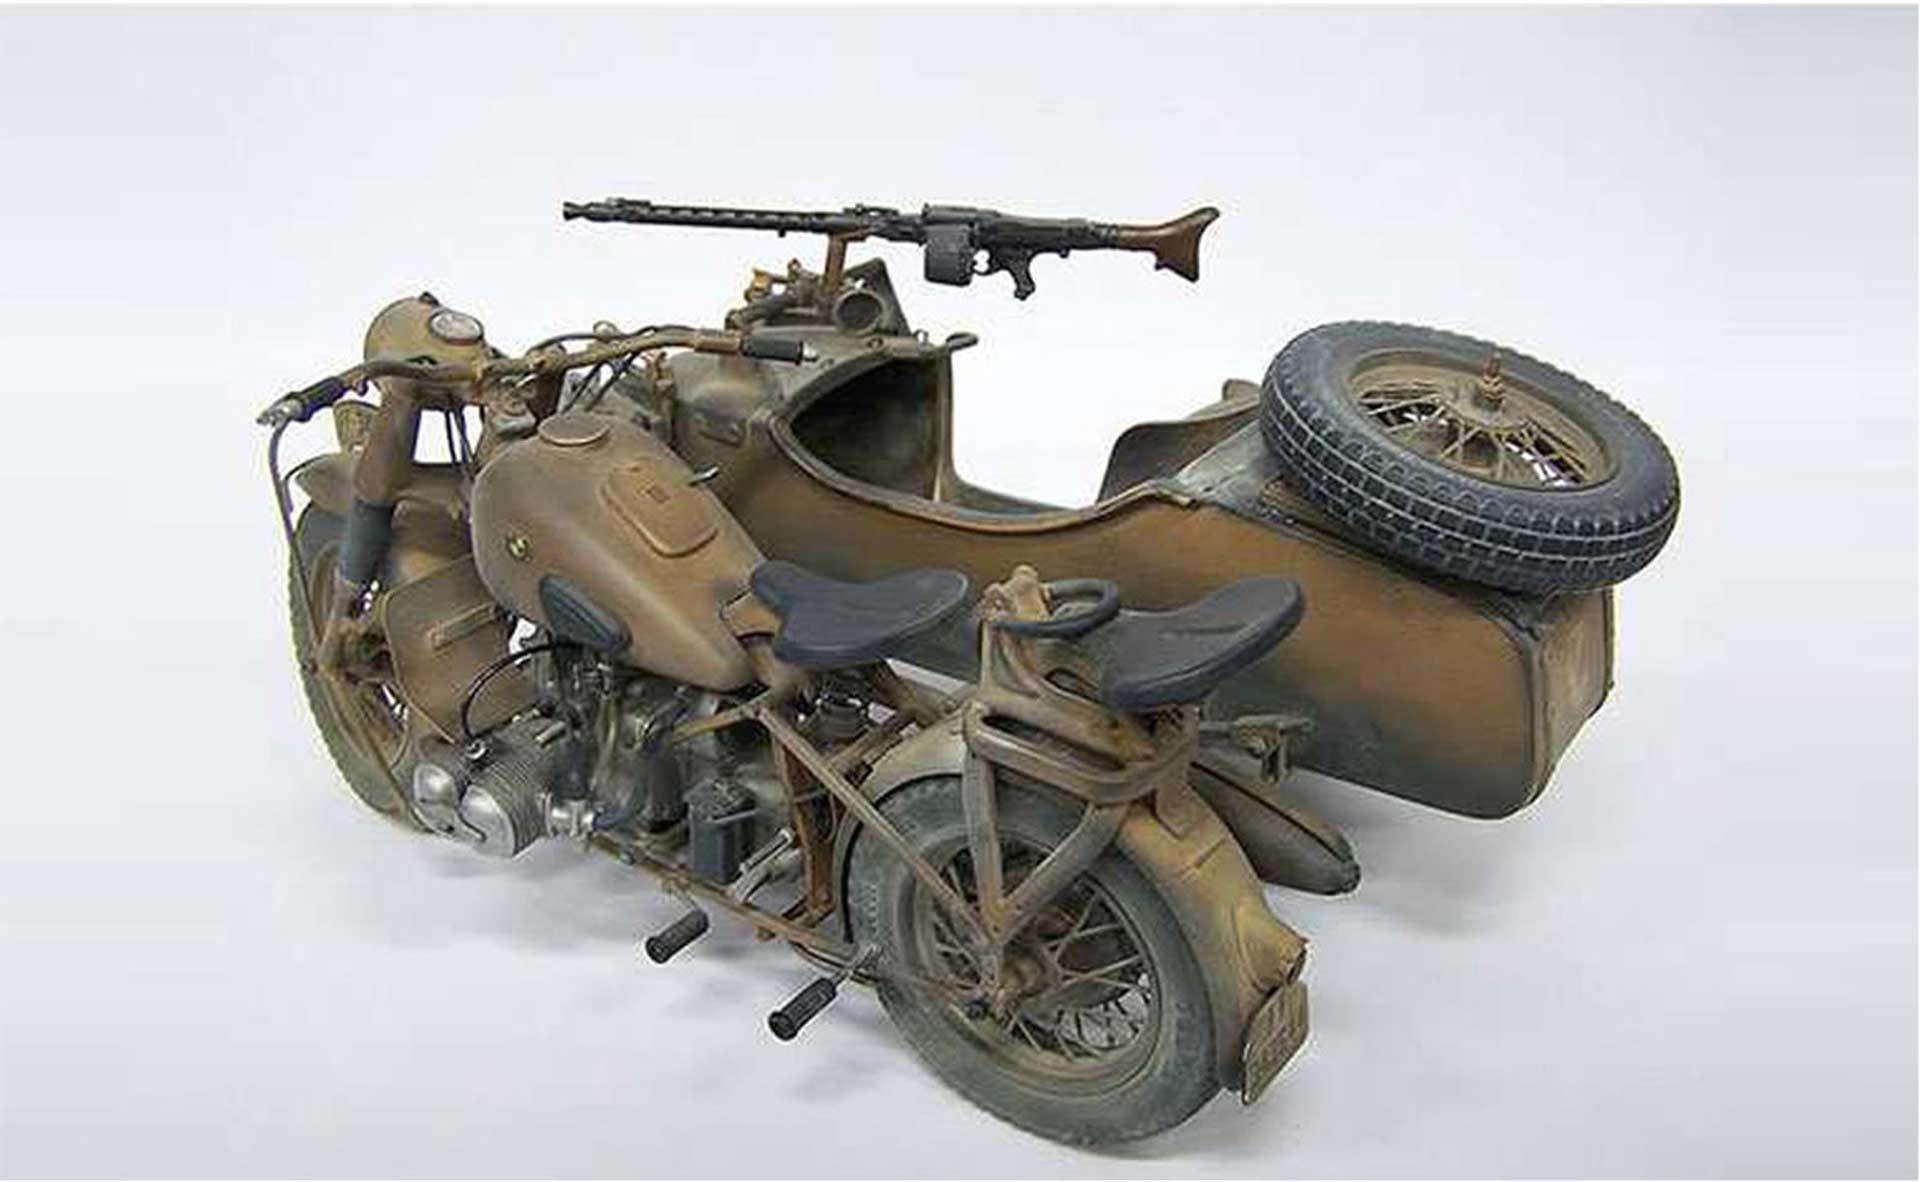 ITALERI 1:9 BMW R75 GERMAN MILIT.MOTOR.W/SIDECAR PLASTIC CONSTRUCTION KIT